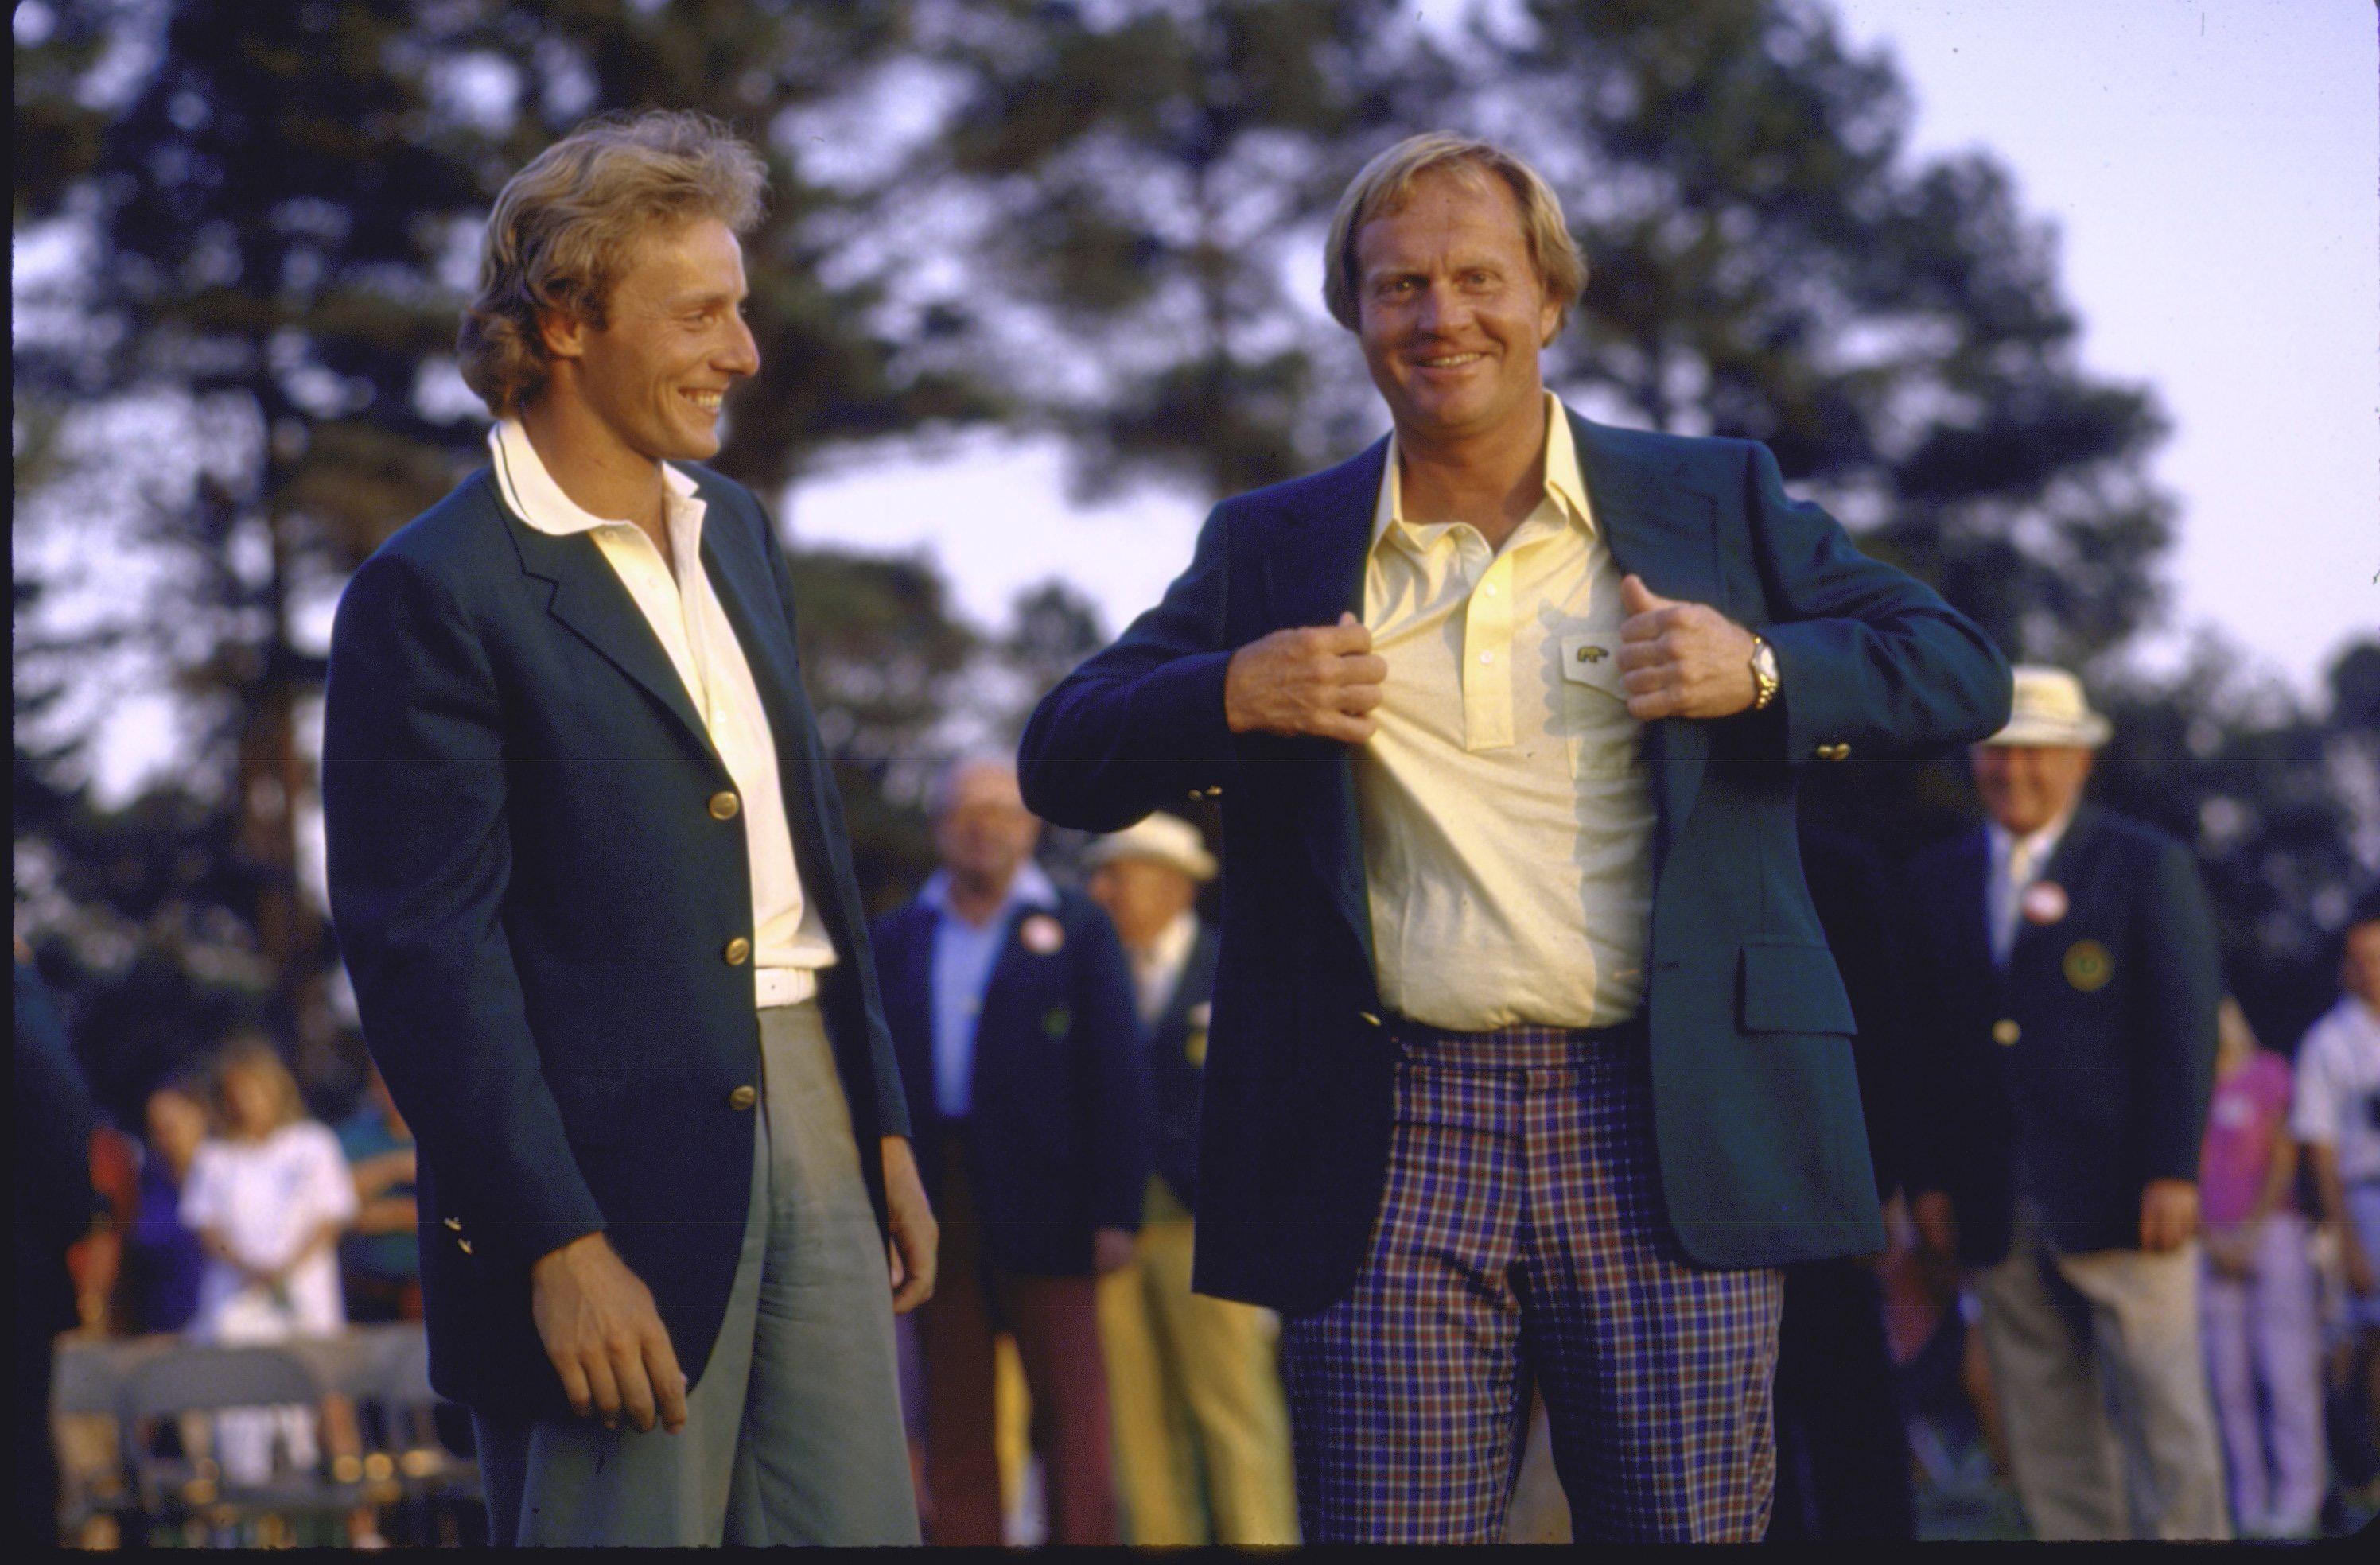 Jack Nicklaus and Bernard Langer at the 1986 Masters after Nicklaus' last major championship.